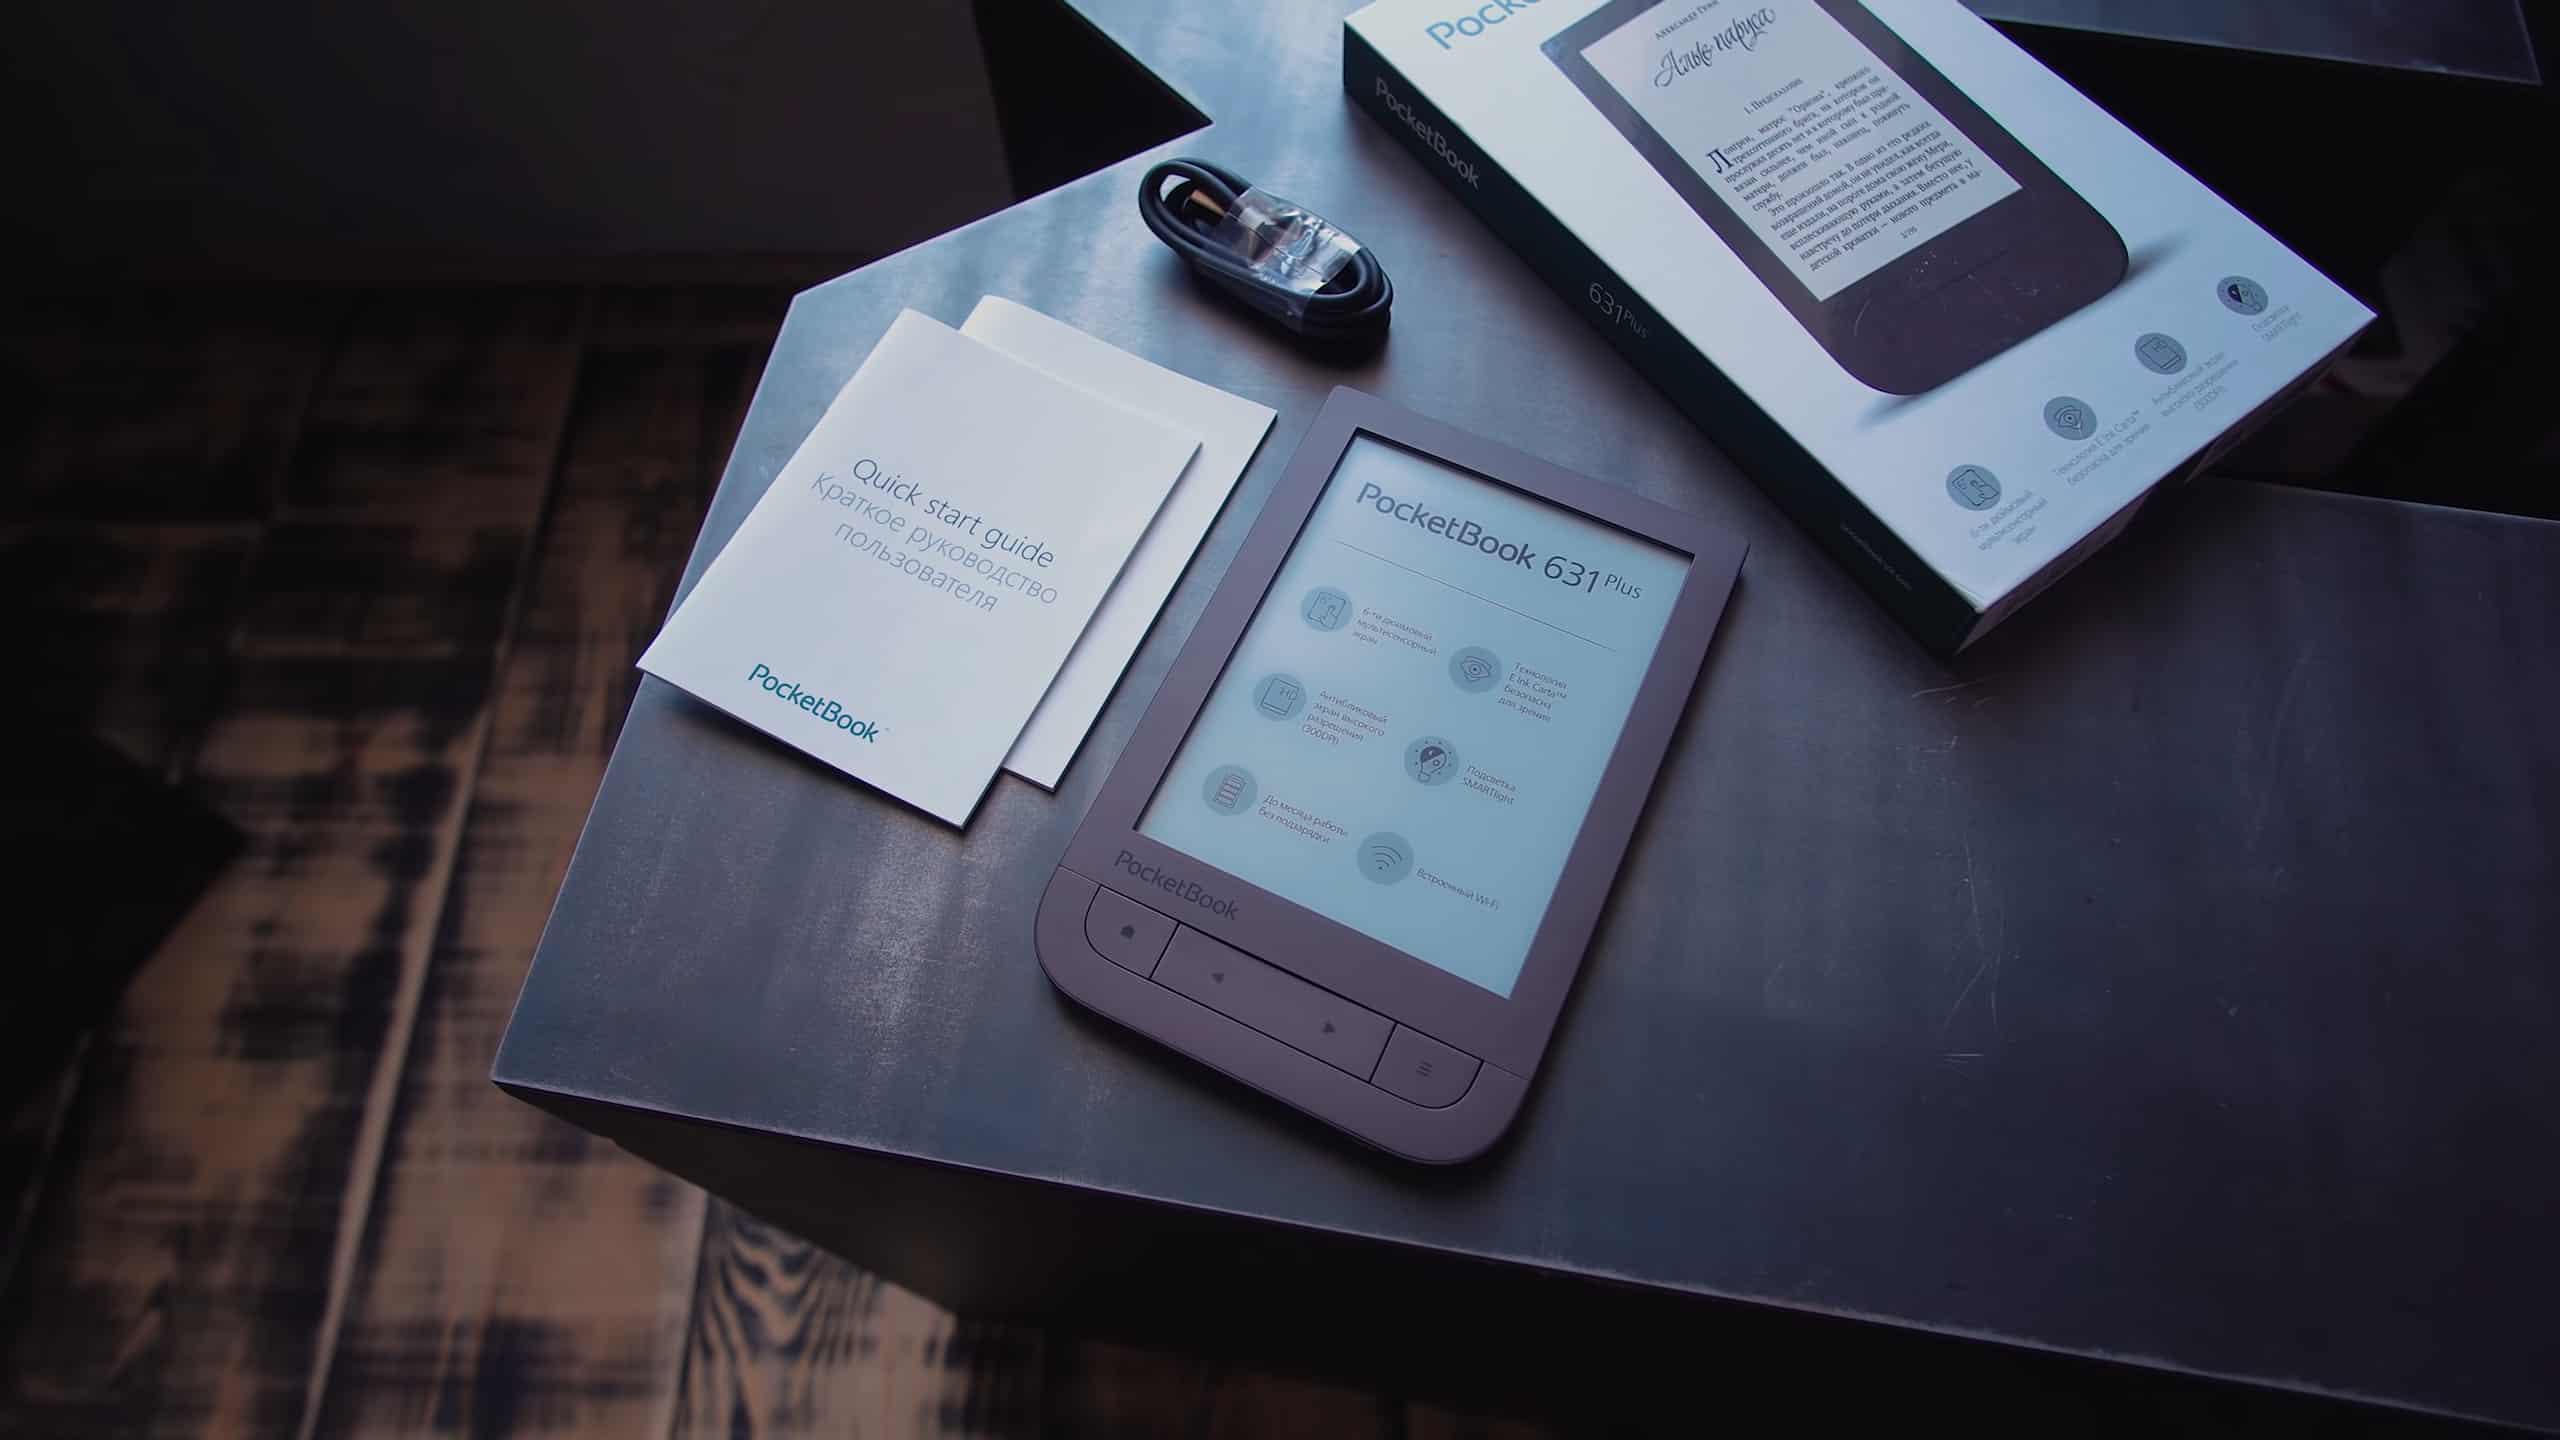 Комплектация PocketBook 631 Plus